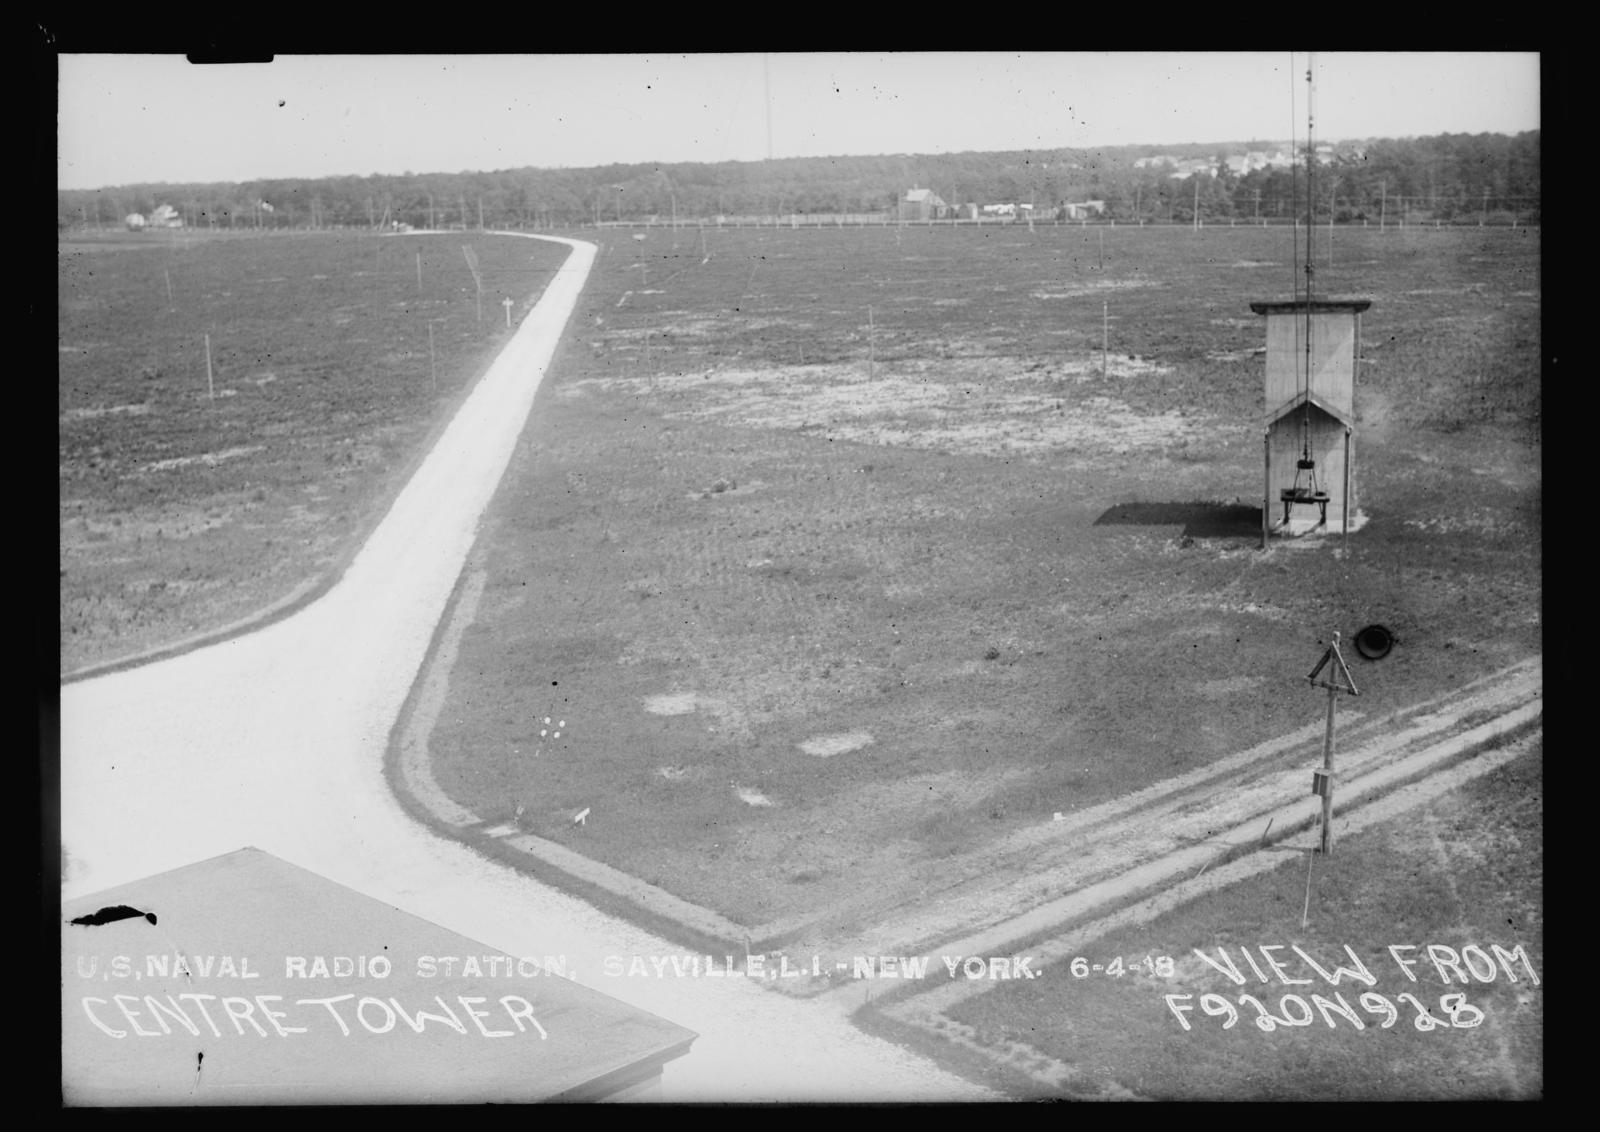 U S  Naval Radio Station, Sayville, Long Island, New York